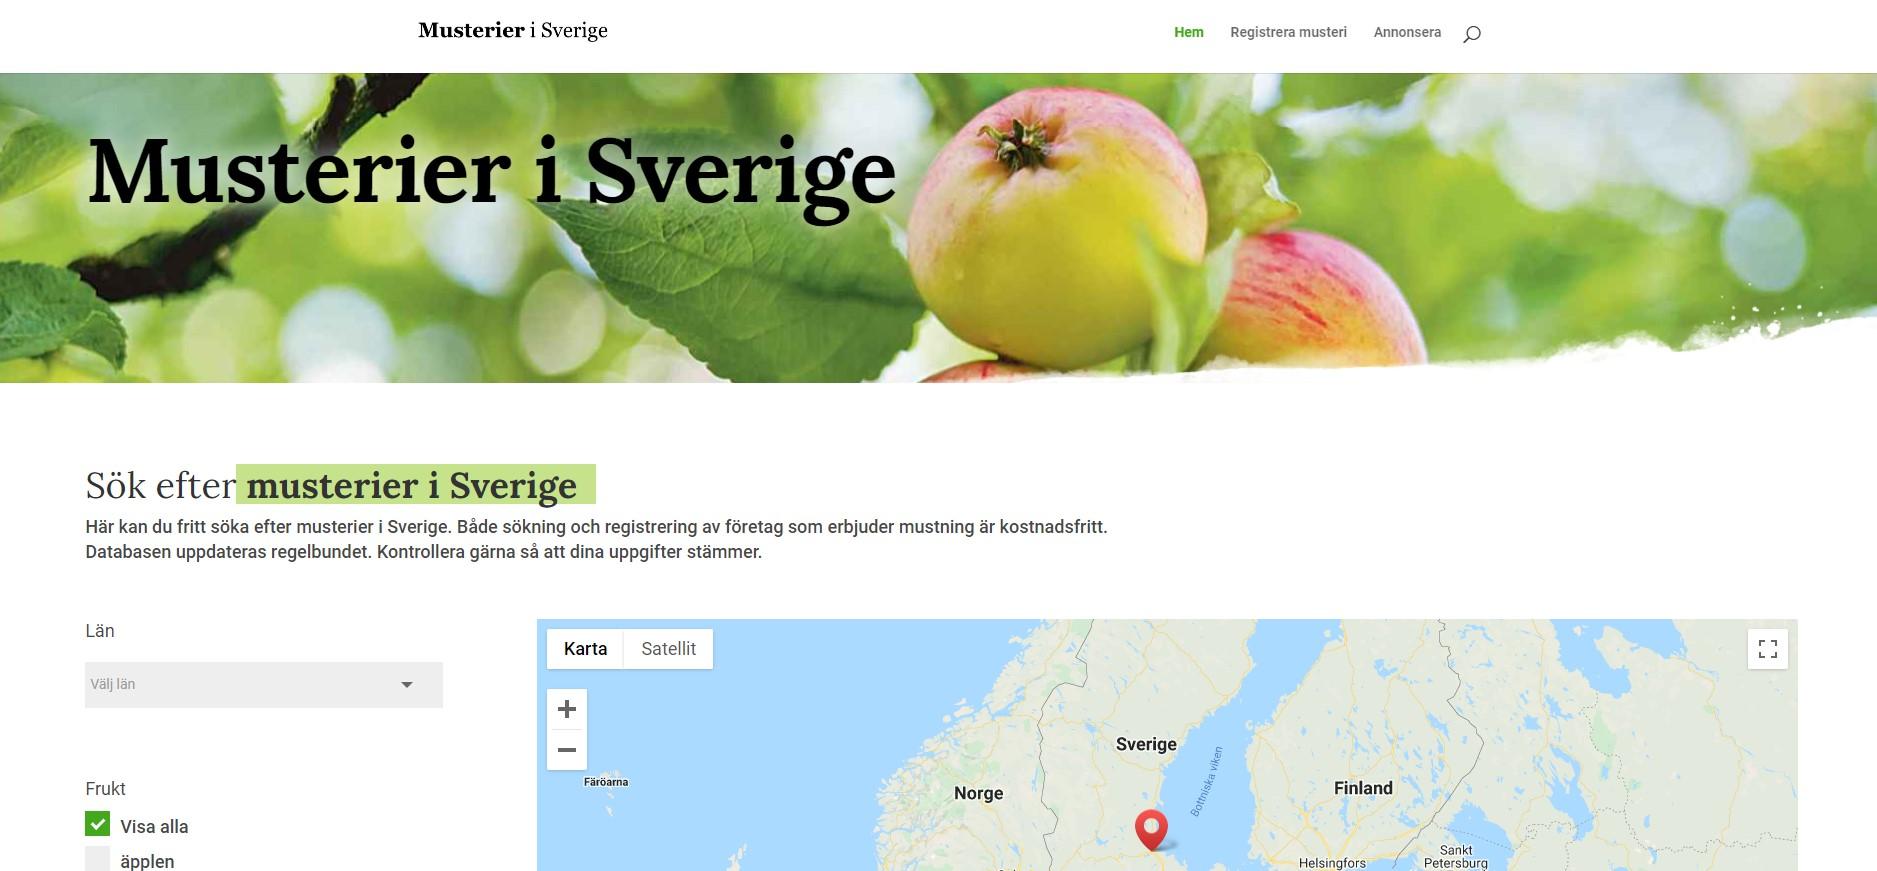 Bild: Musterier i Sverige